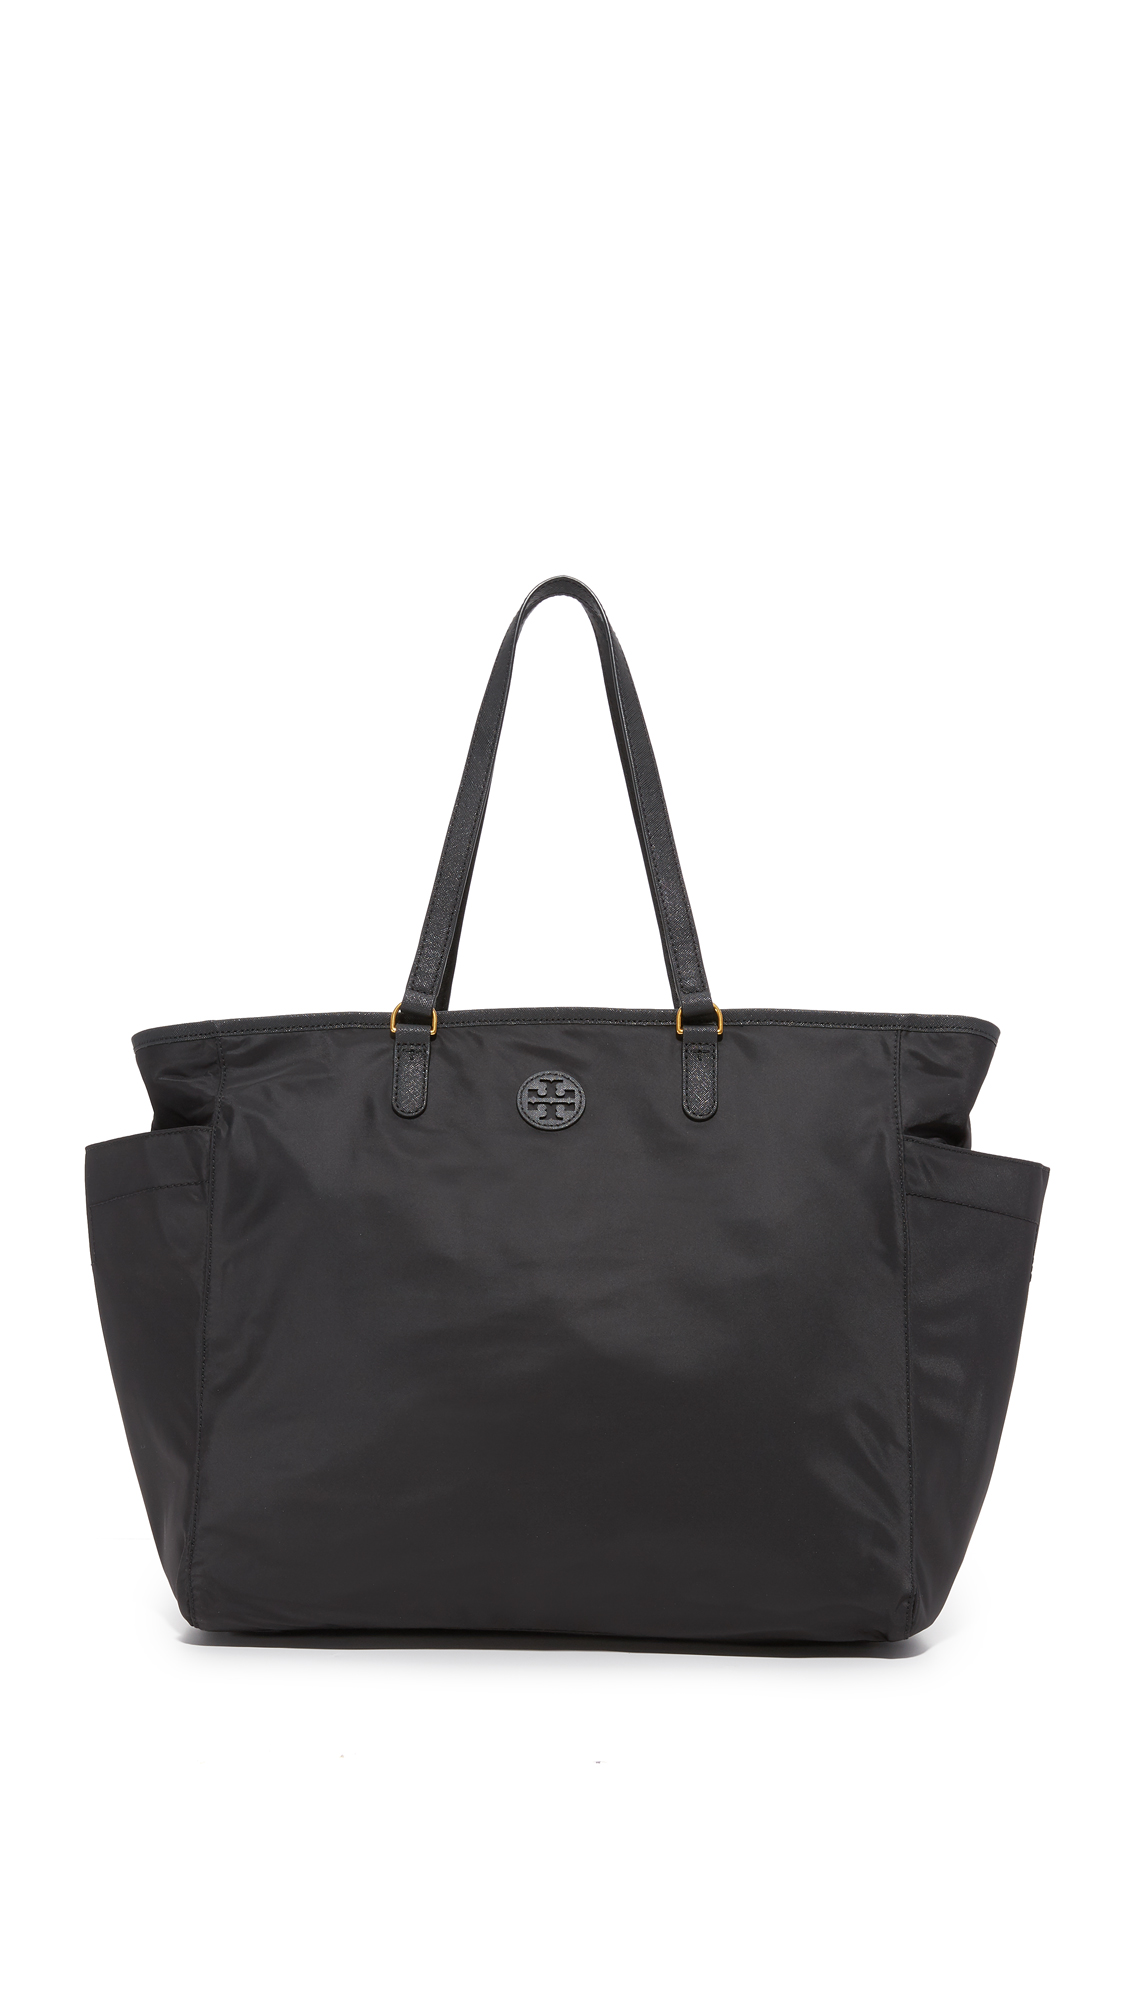 tory burch female tory burch scout nylon baby bag tote black